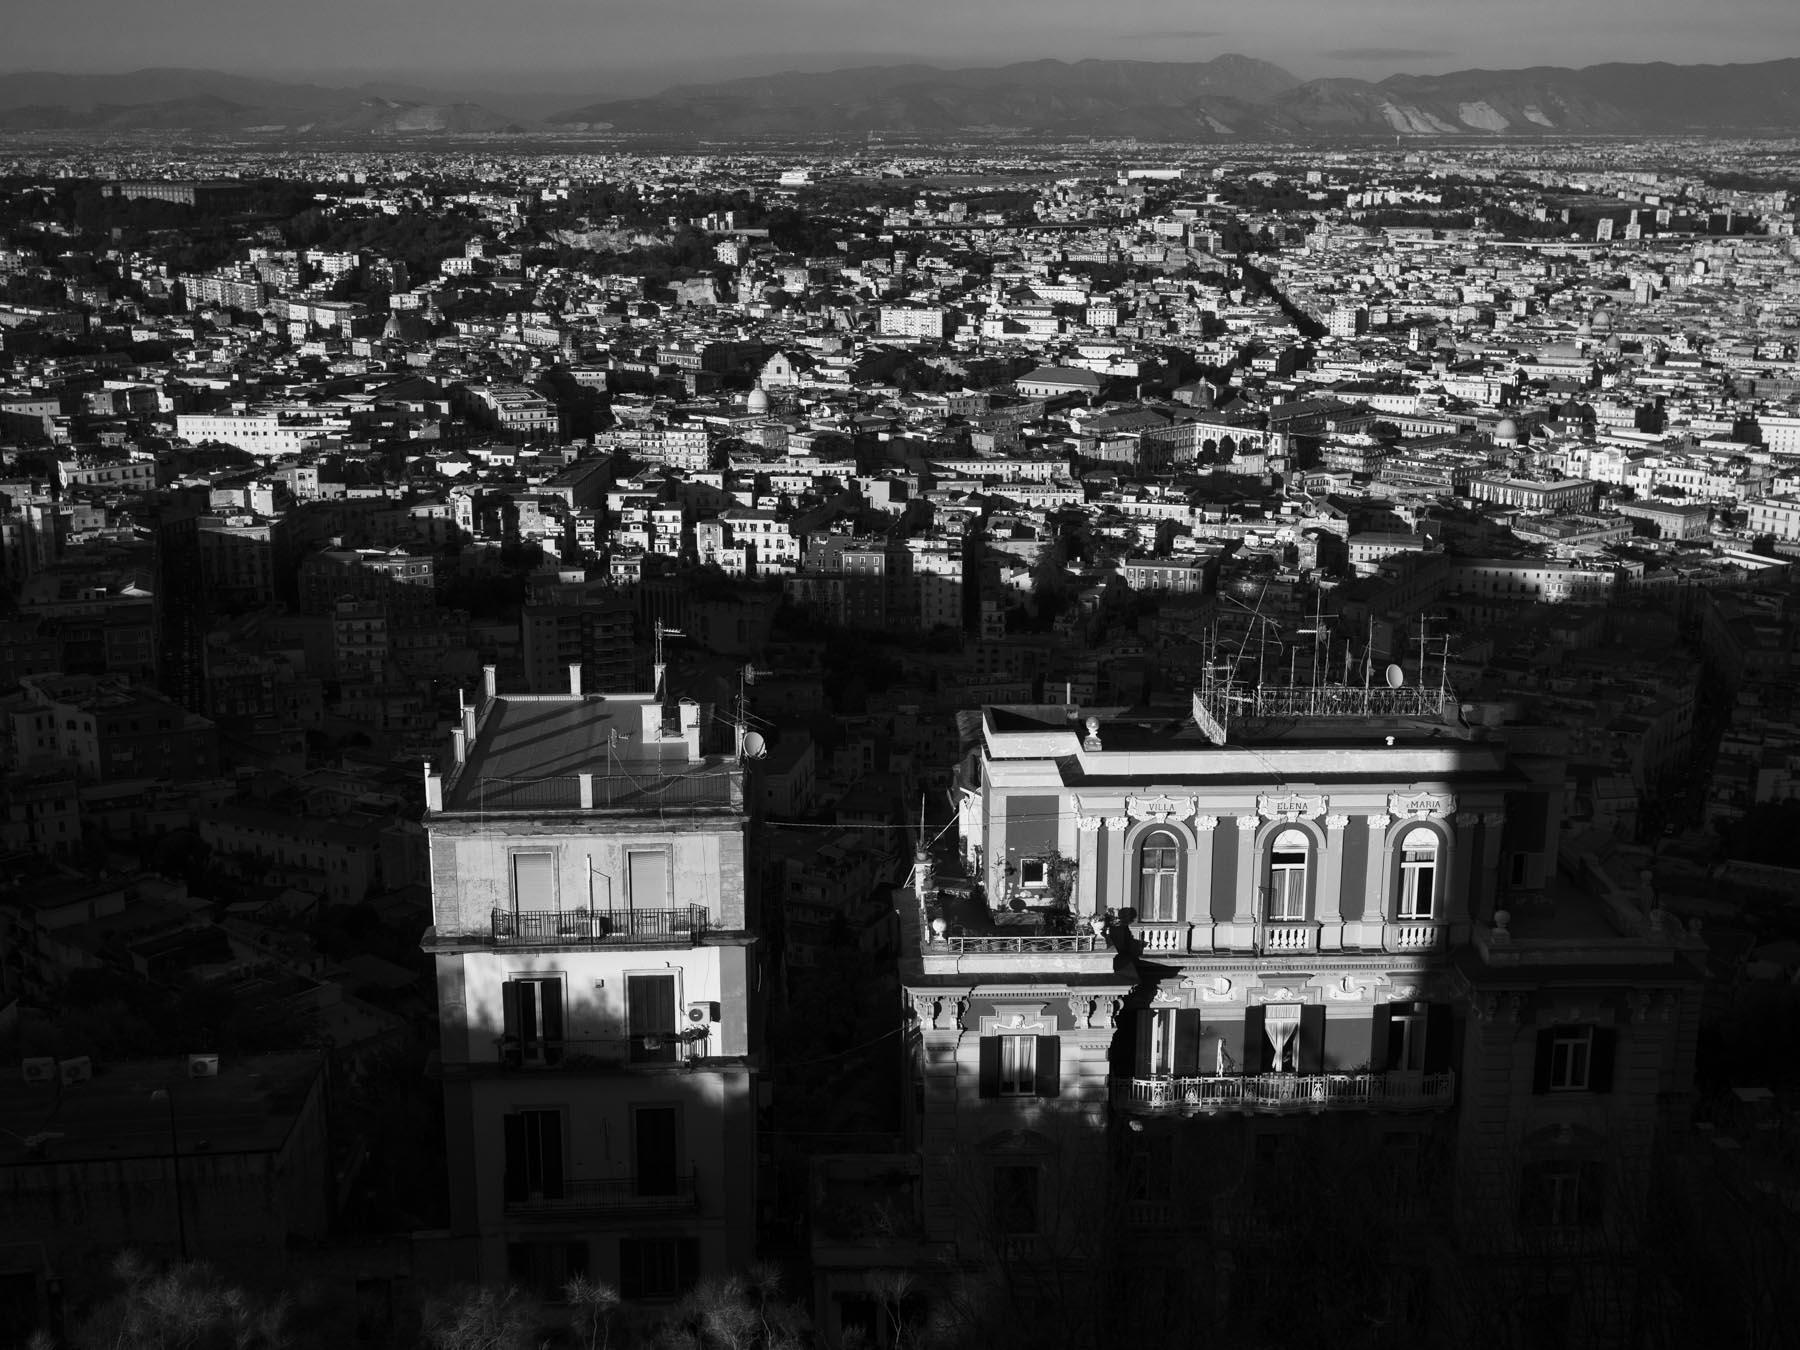 06_Napoli_1024761_p